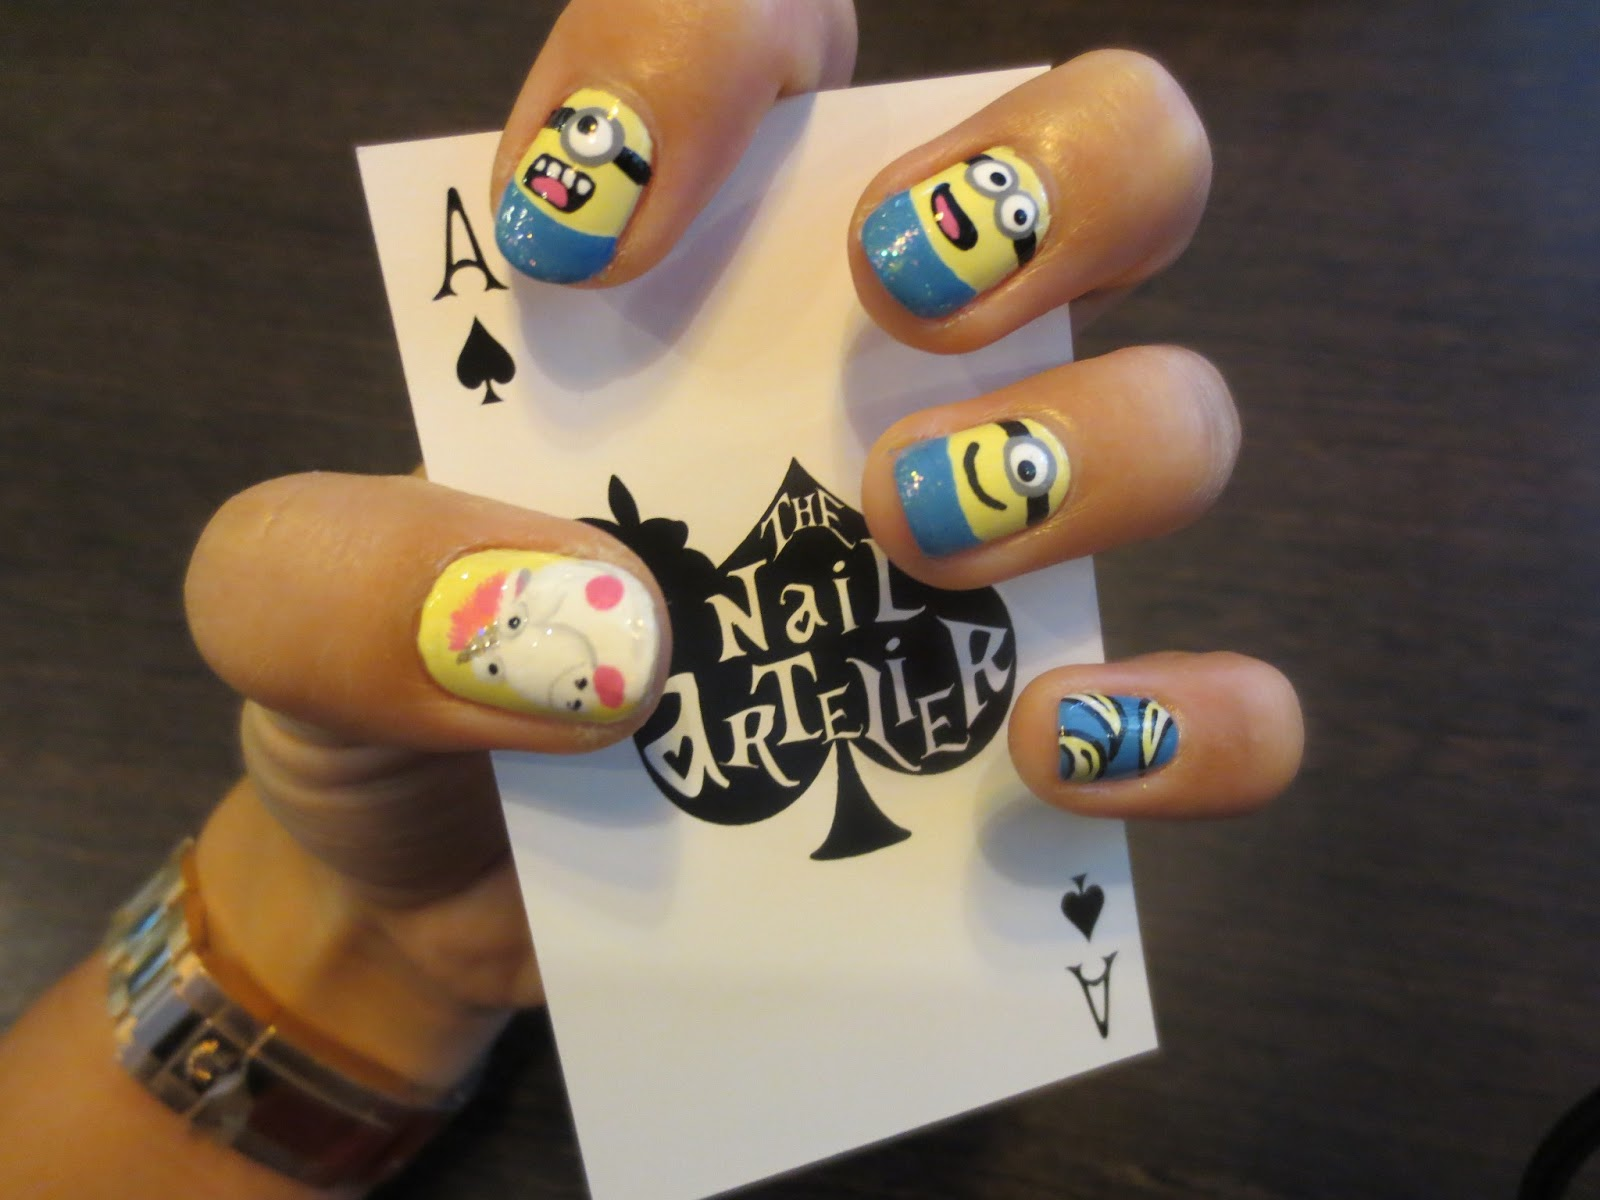 despicable me unicorn nails - photo #24